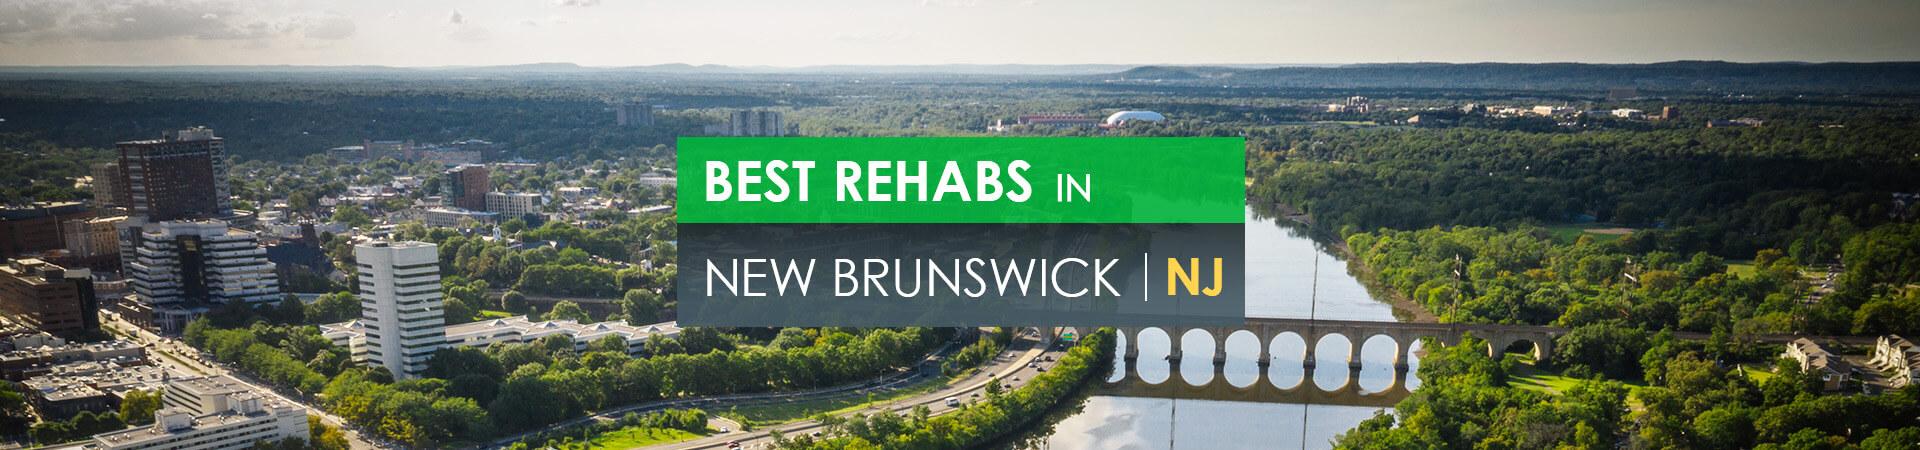 Best rehabs in New Brunswick, NJ